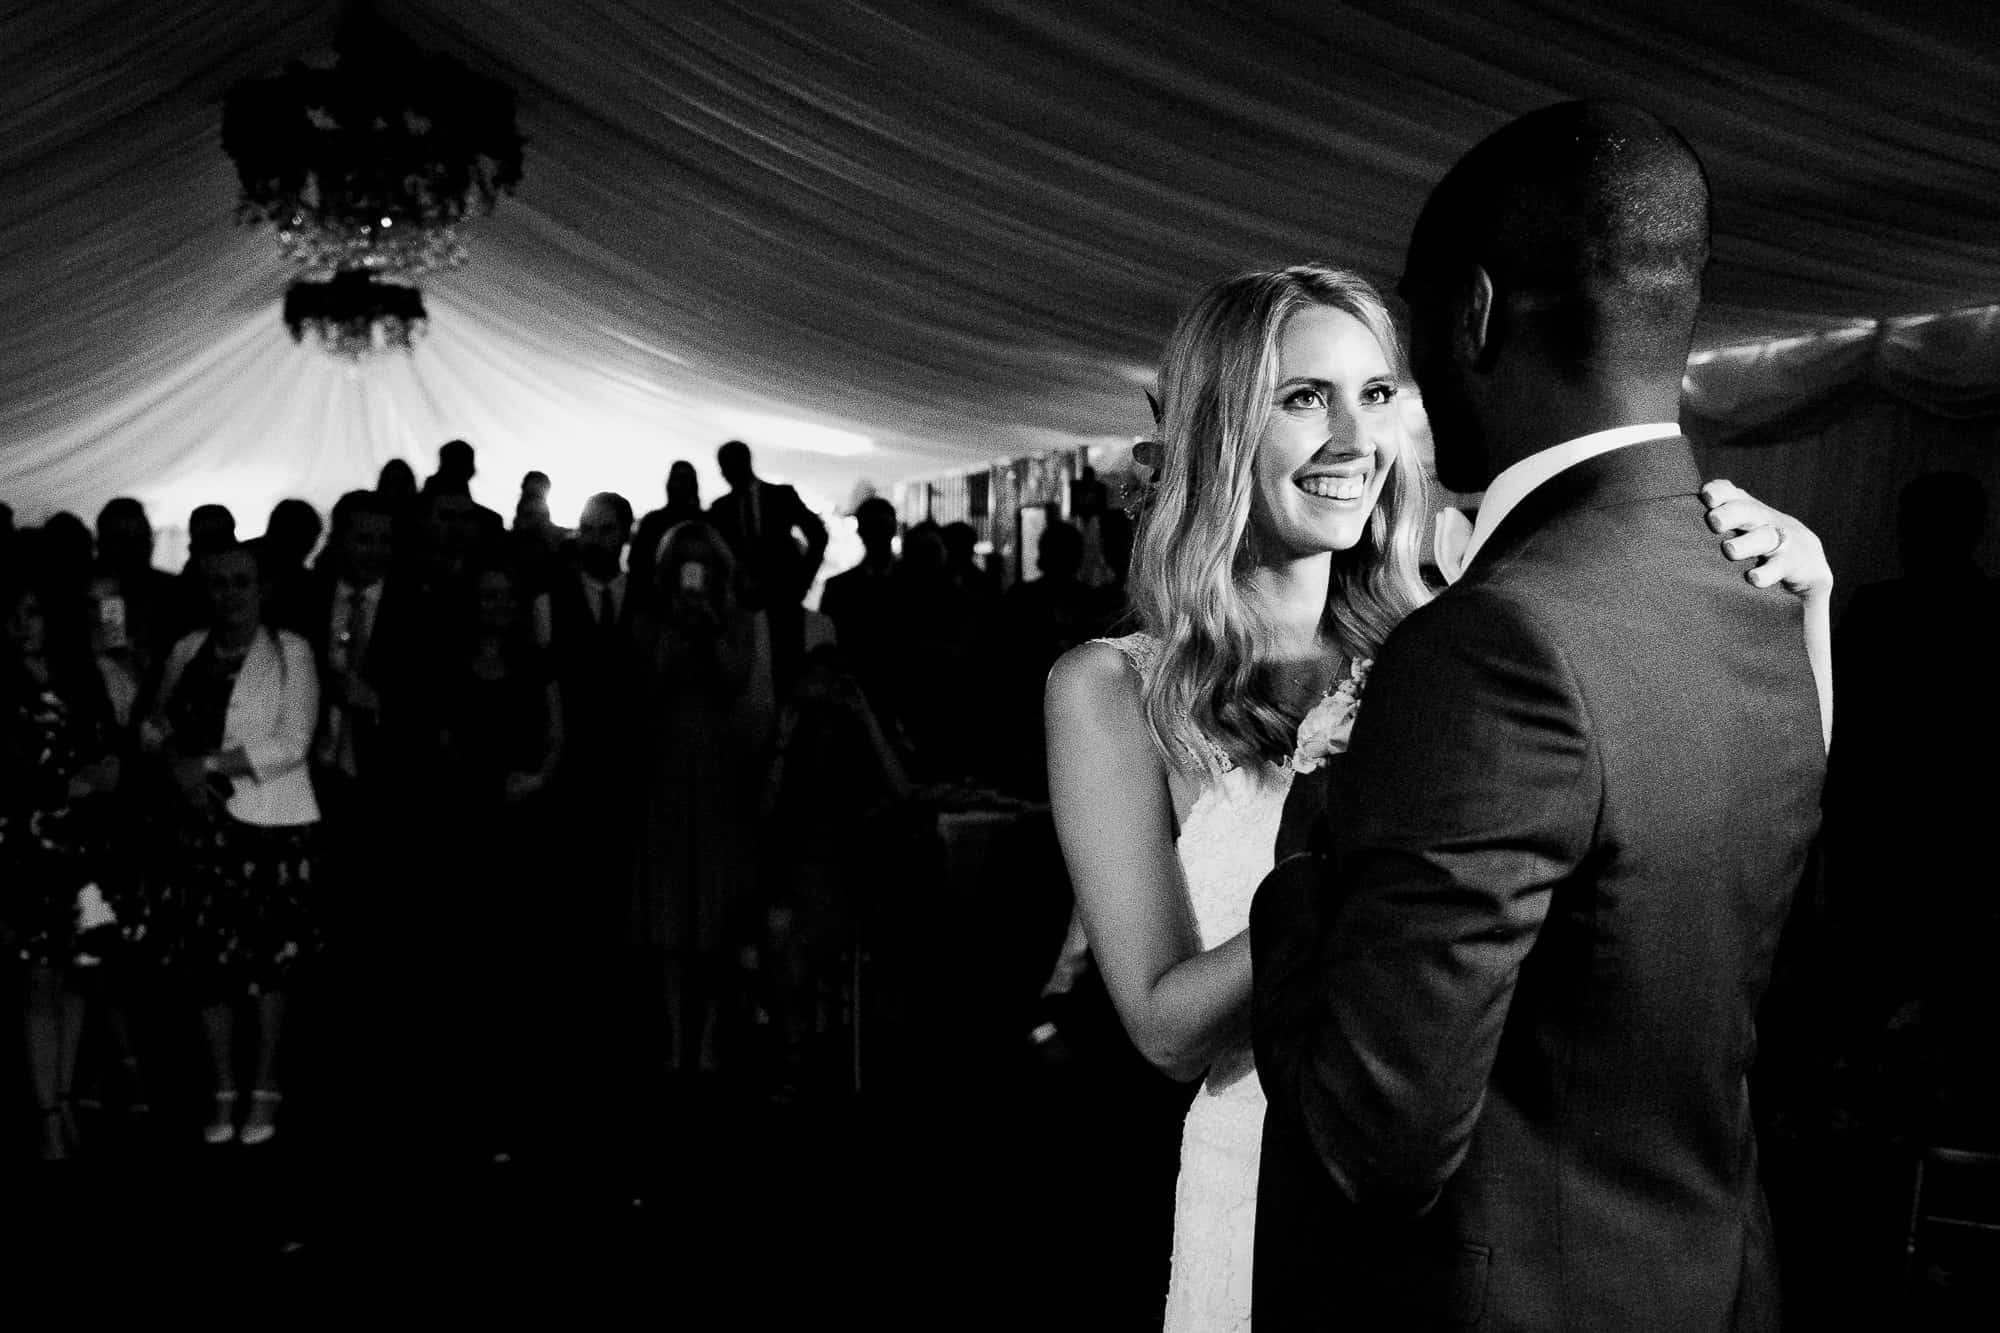 marleybrook-house-wedding-photography-matt-tyler-0063